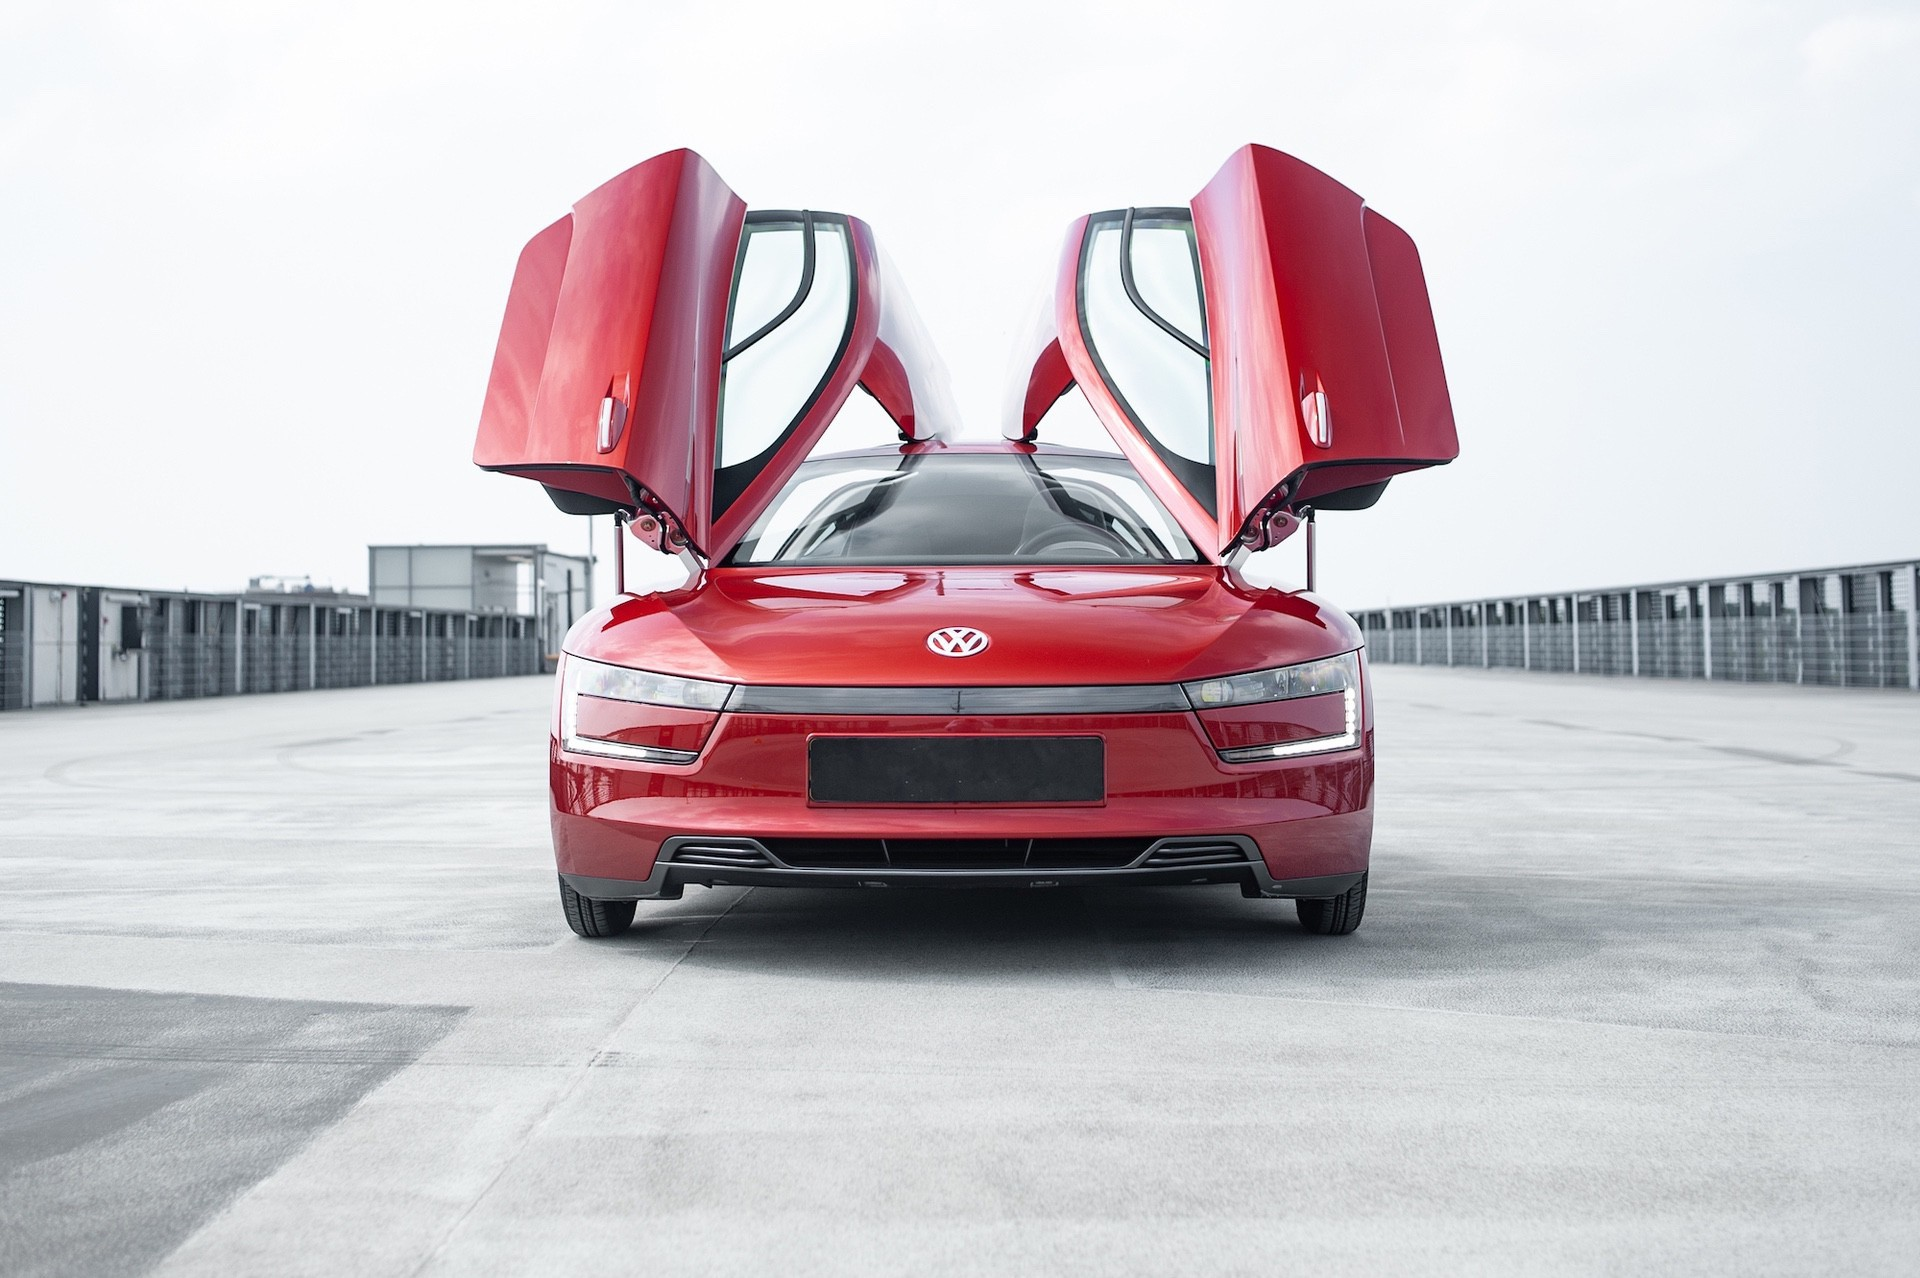 Volkswagen_XL1_sale-0021